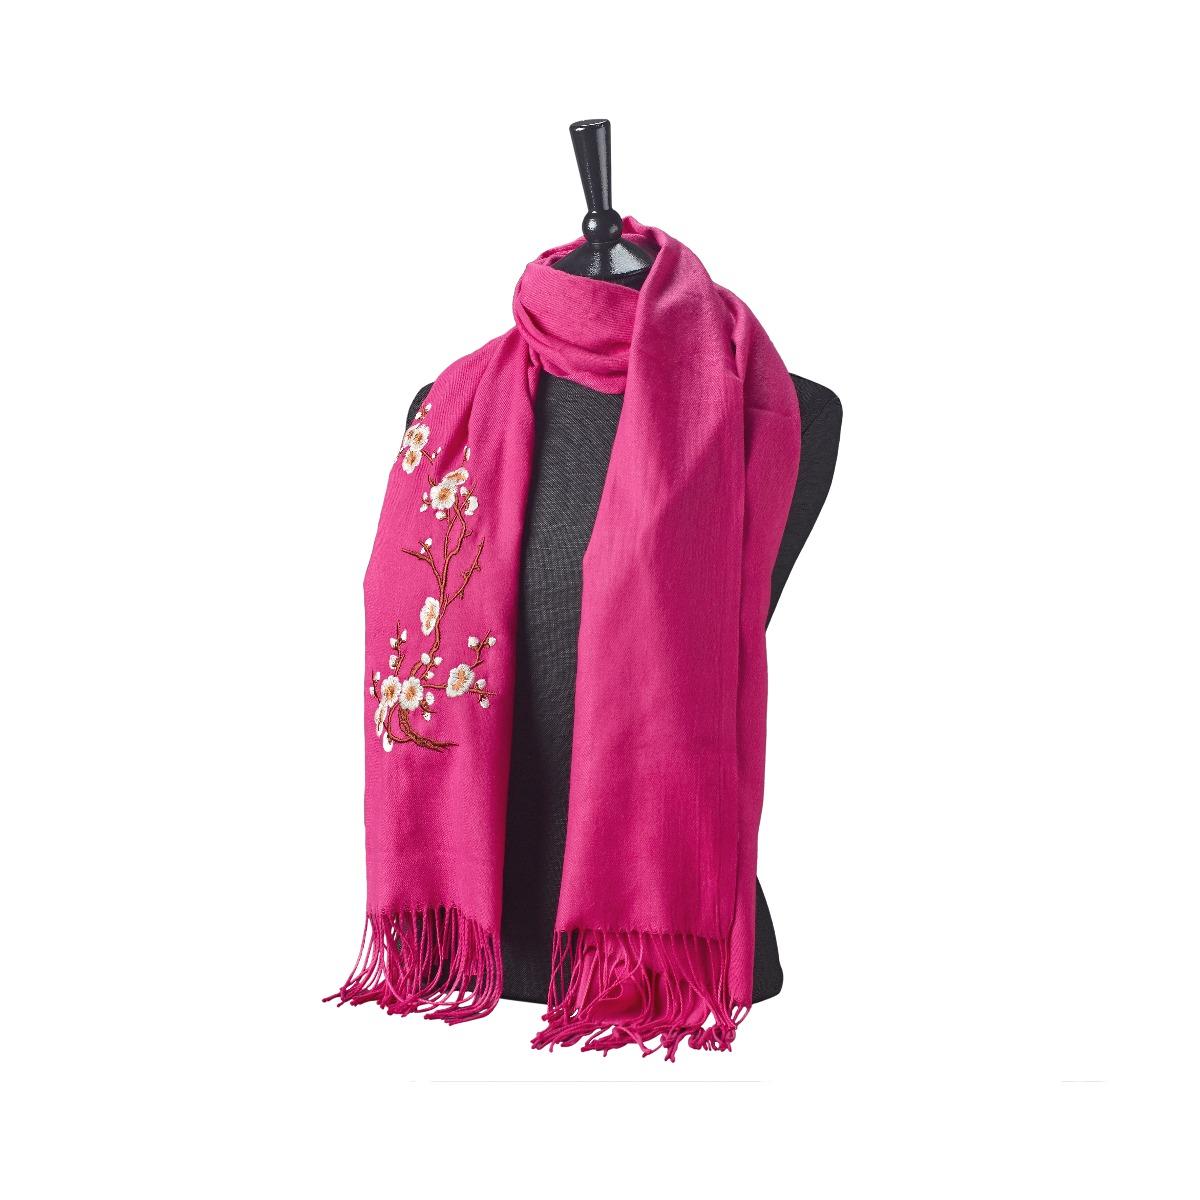 Cherry blossom scarf (pink)